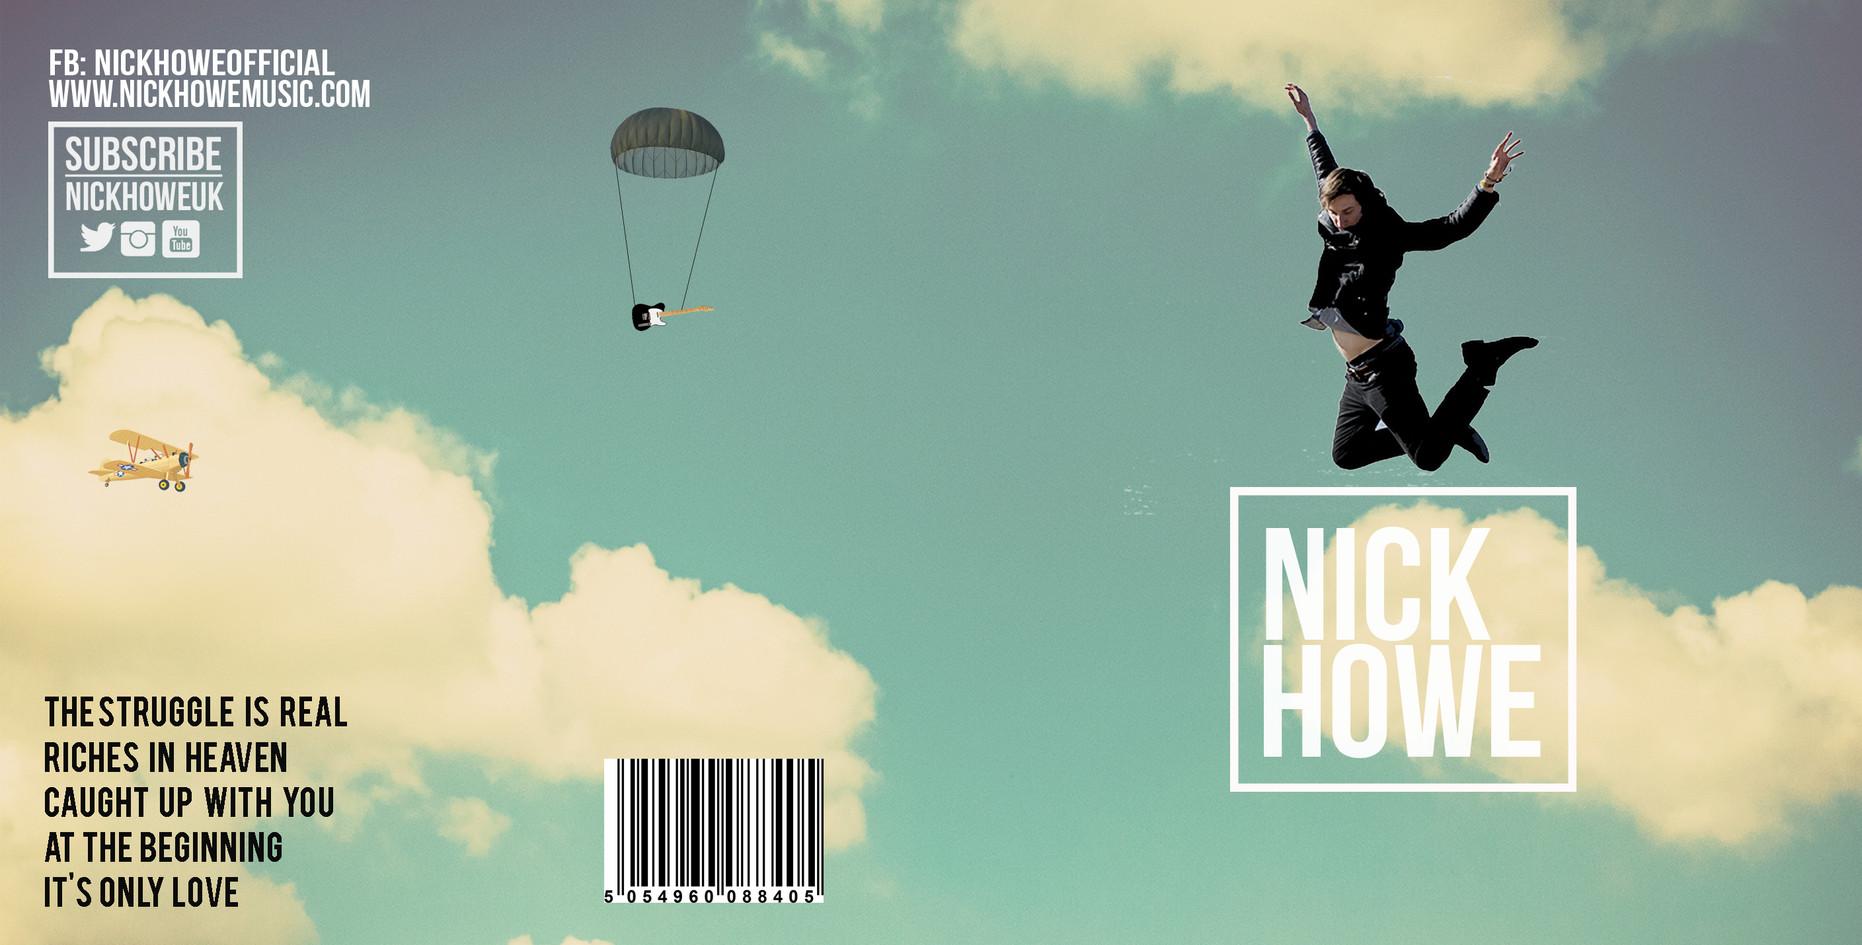 nickepcover1-2.jpg